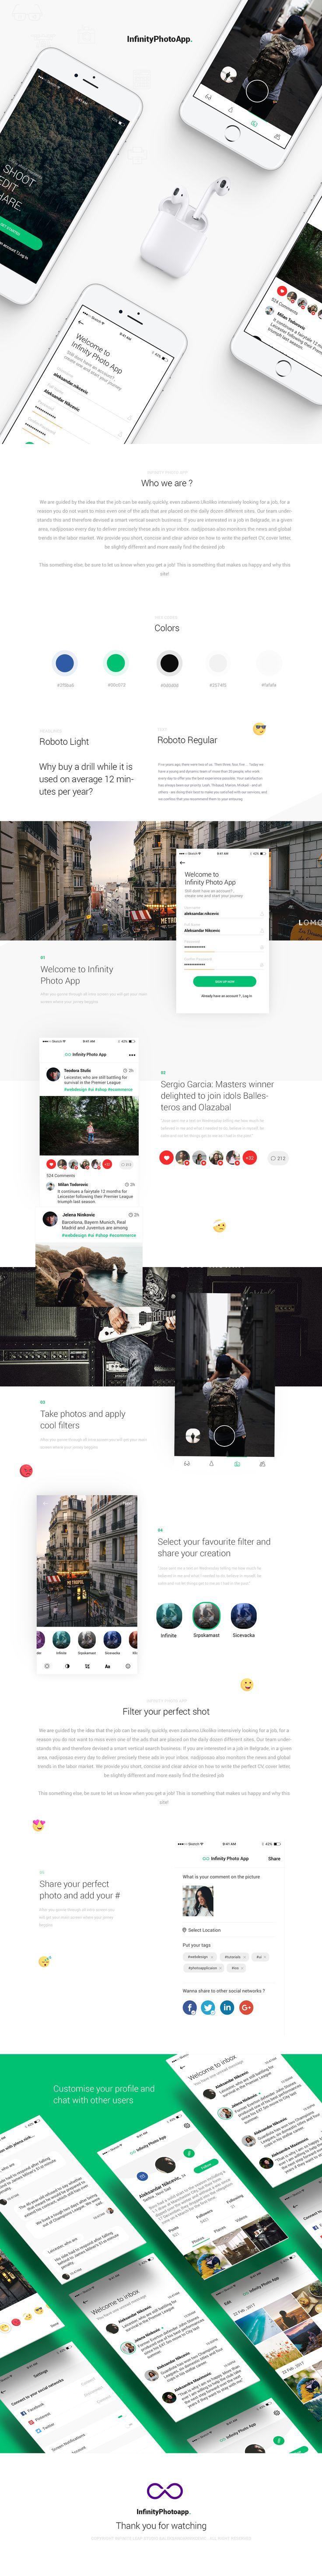 Infinite Photo App - Create image your way on Behance